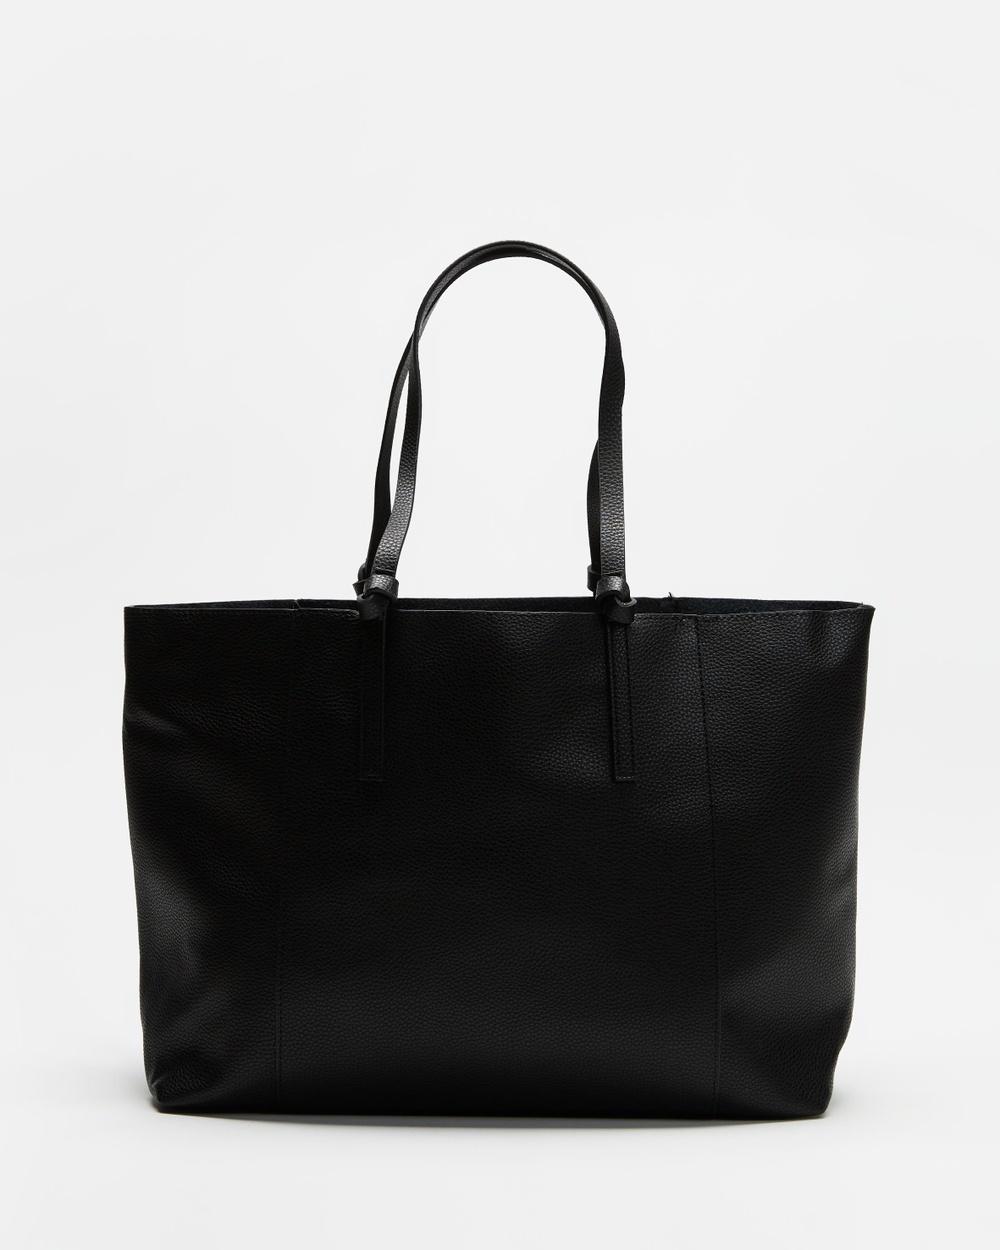 M.N.G Placa Tote Bag Bags Black